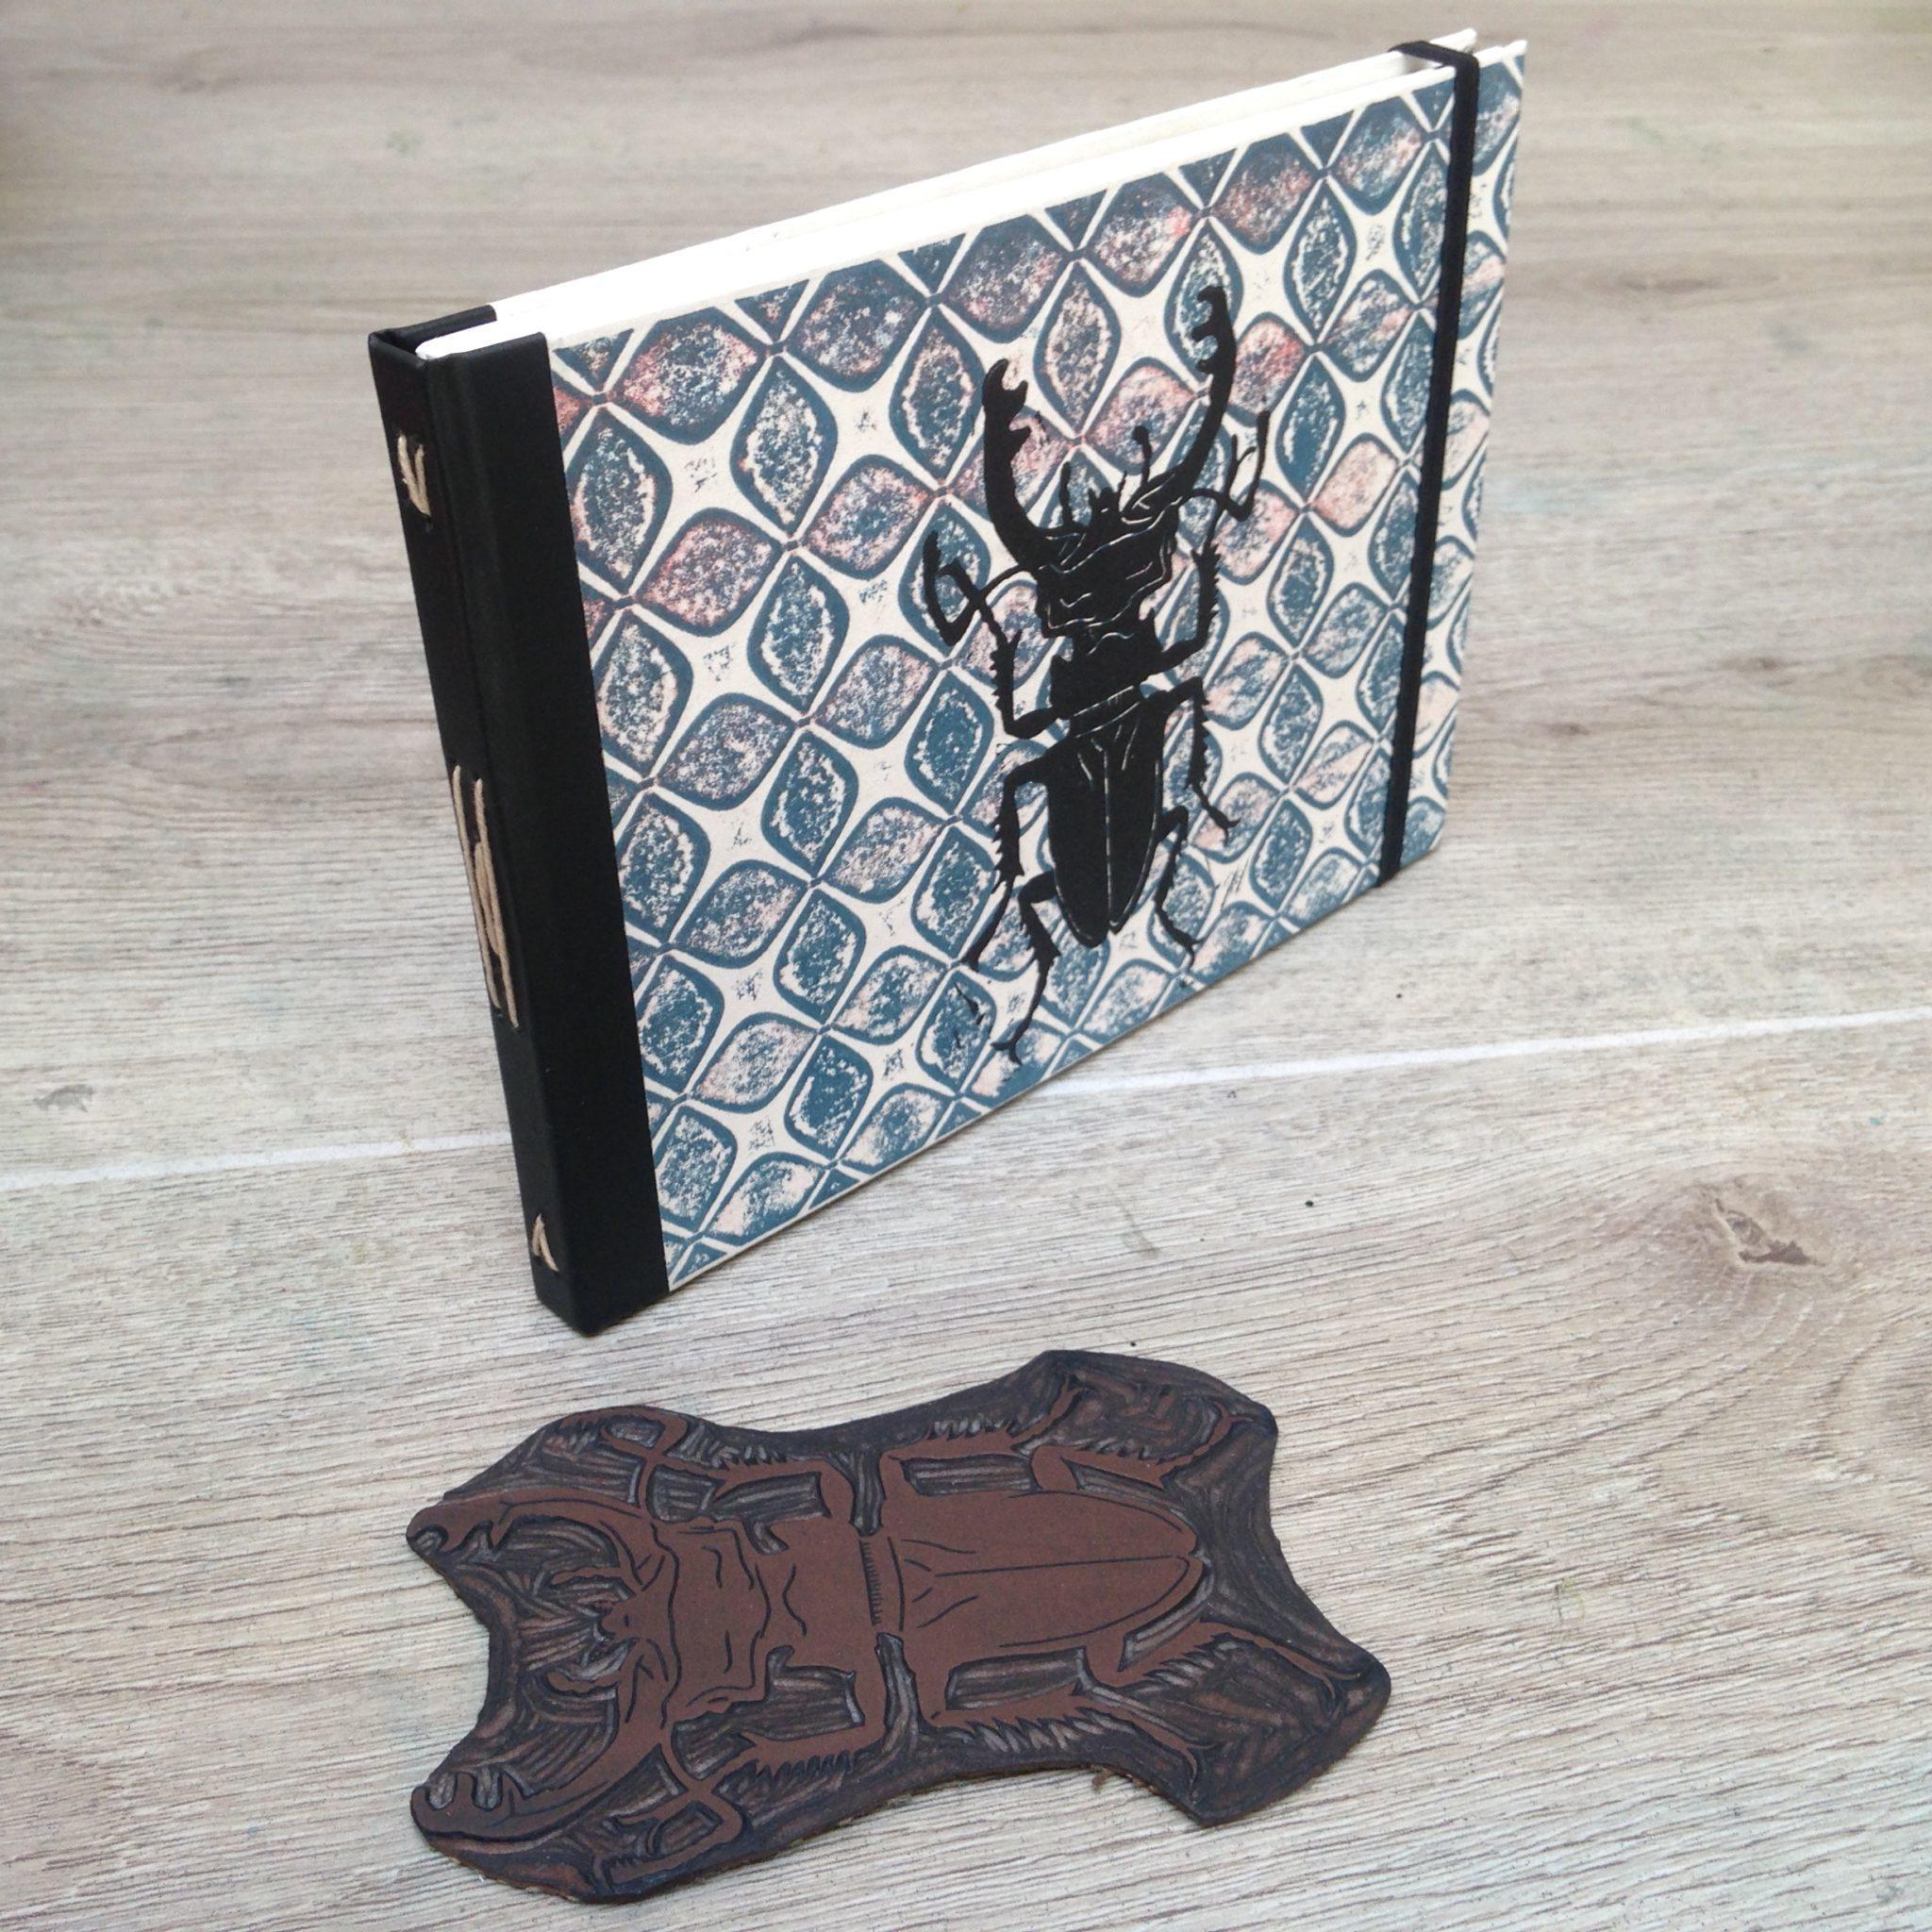 LinoLino | Linogravure et créations à partir d'impressions artisanales | Chambéry, France | Impression originale illustration insecte azulejos carnet precieux reliure bookbinding